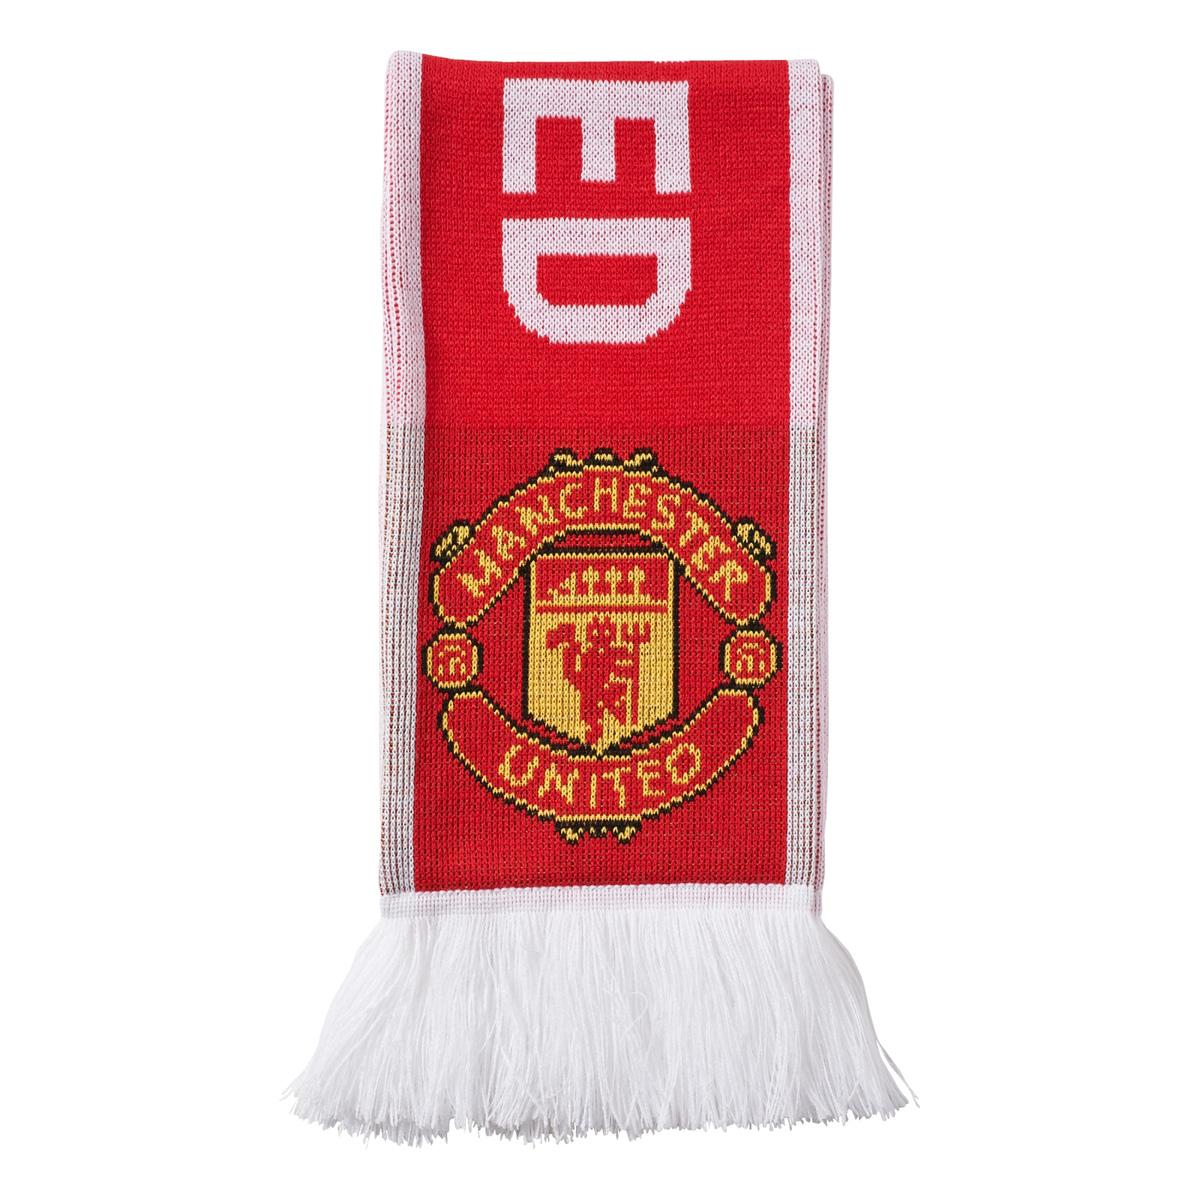 Mufc scarf